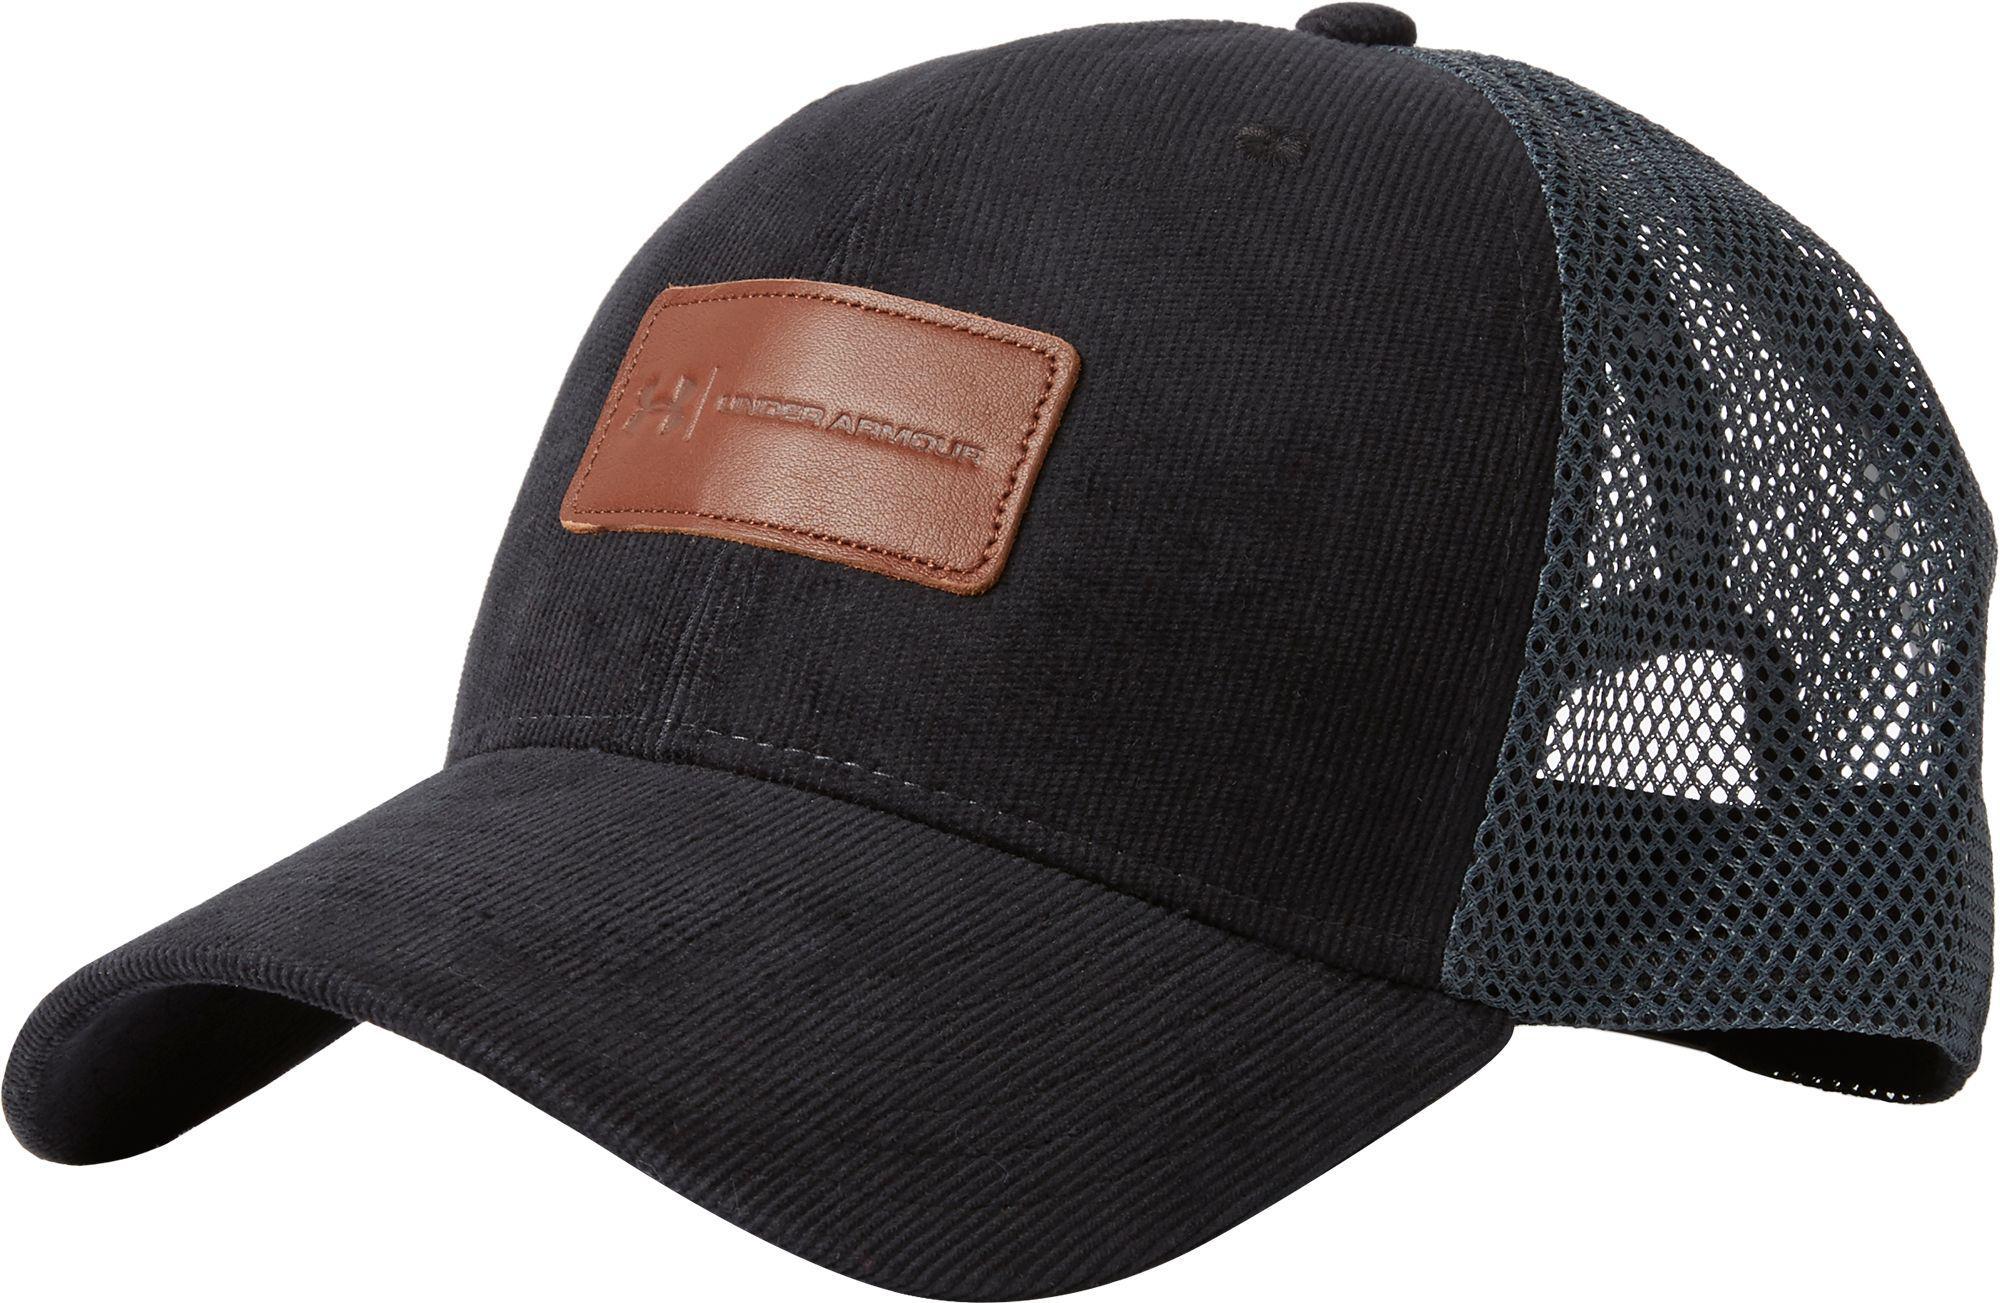 6d7322683d4 Lyst - Under Armour Odp Trucker Hat in Black for Men